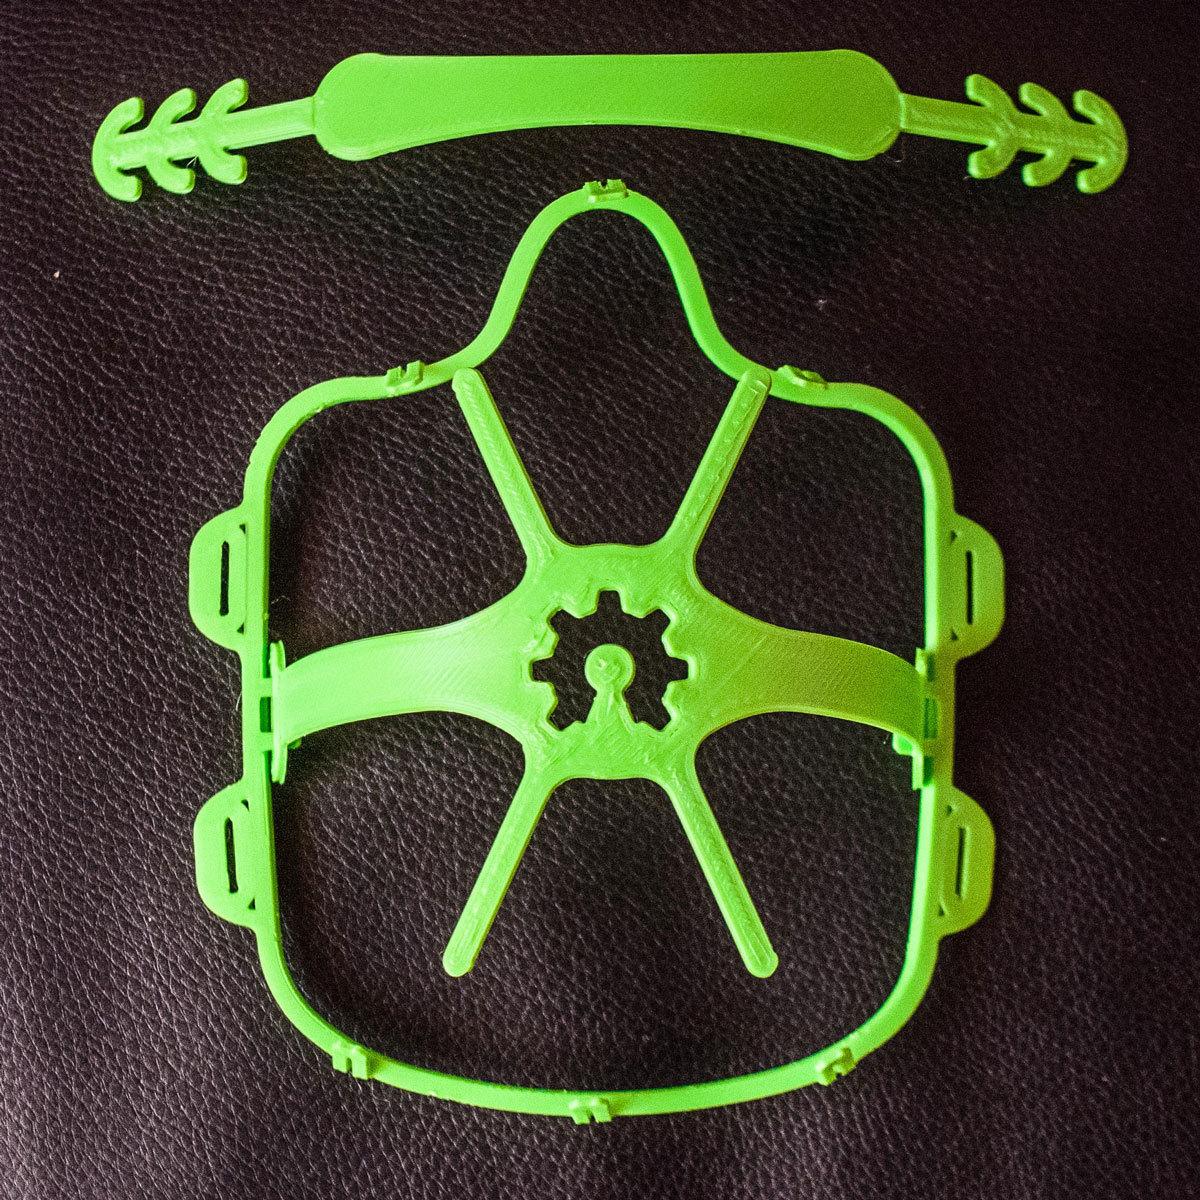 5.jpg Download free STL file Hermetic Mask • 3D print design, Checho3d